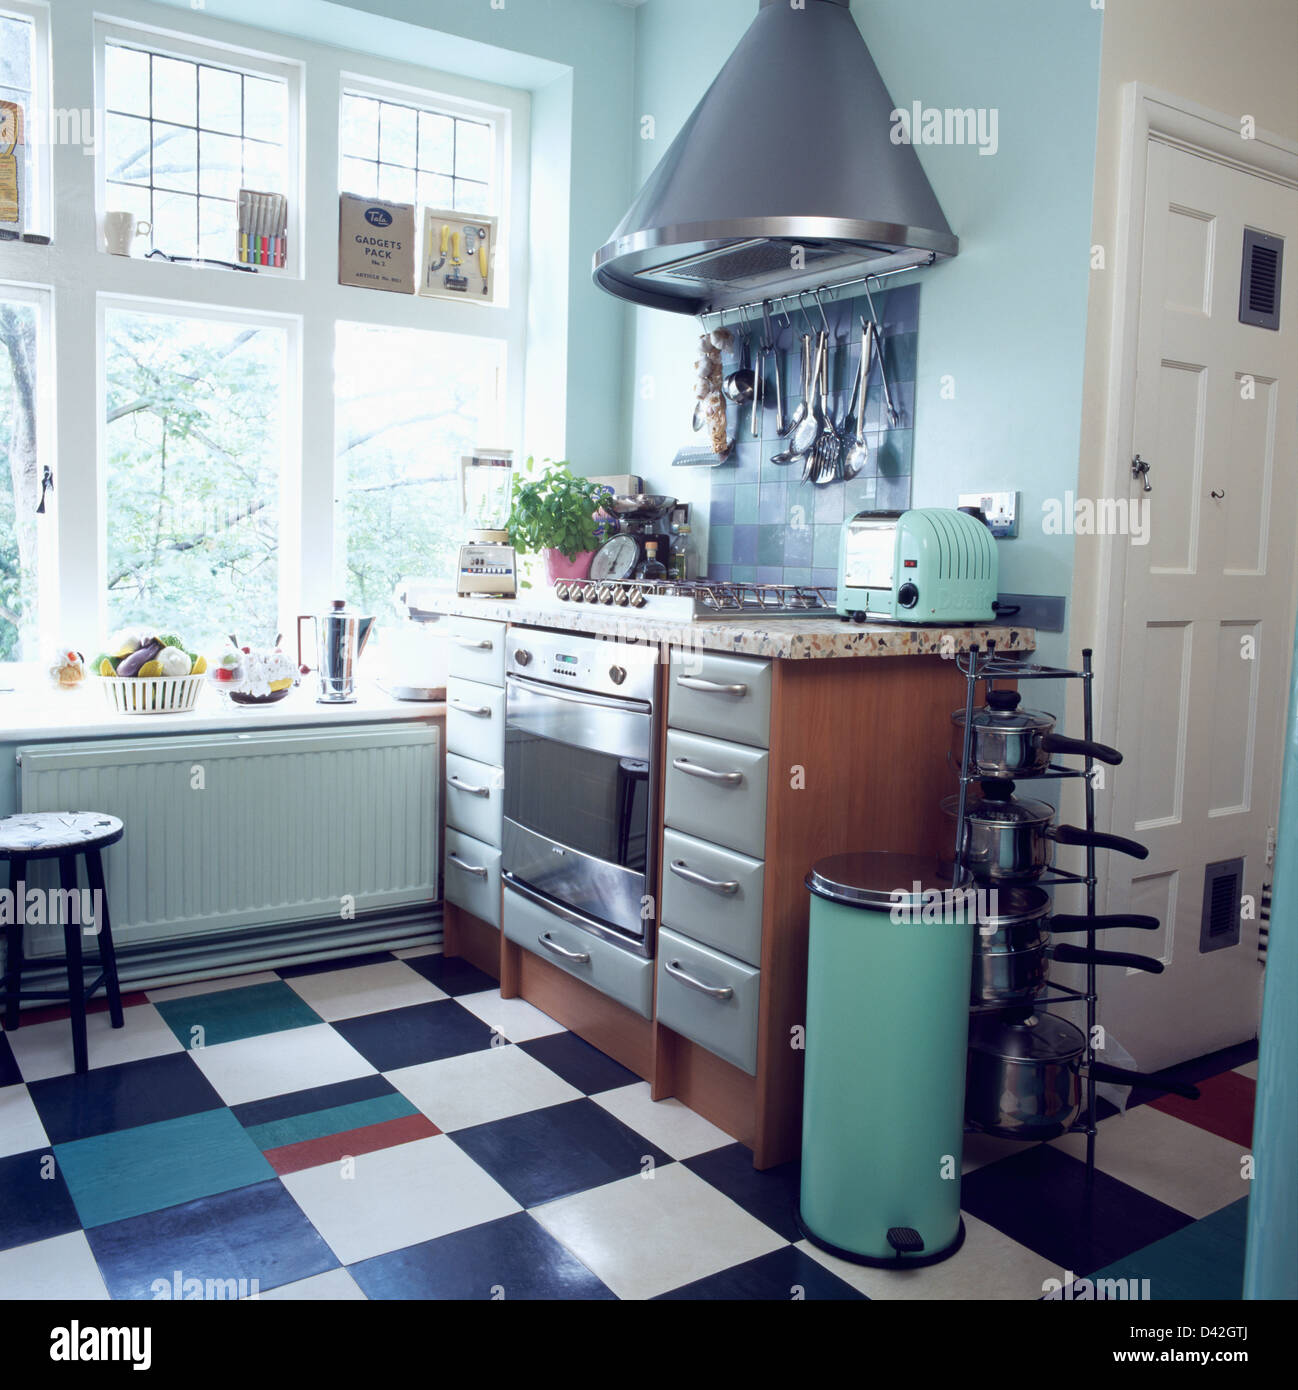 radiator floors stockfotos radiator floors bilder alamy. Black Bedroom Furniture Sets. Home Design Ideas